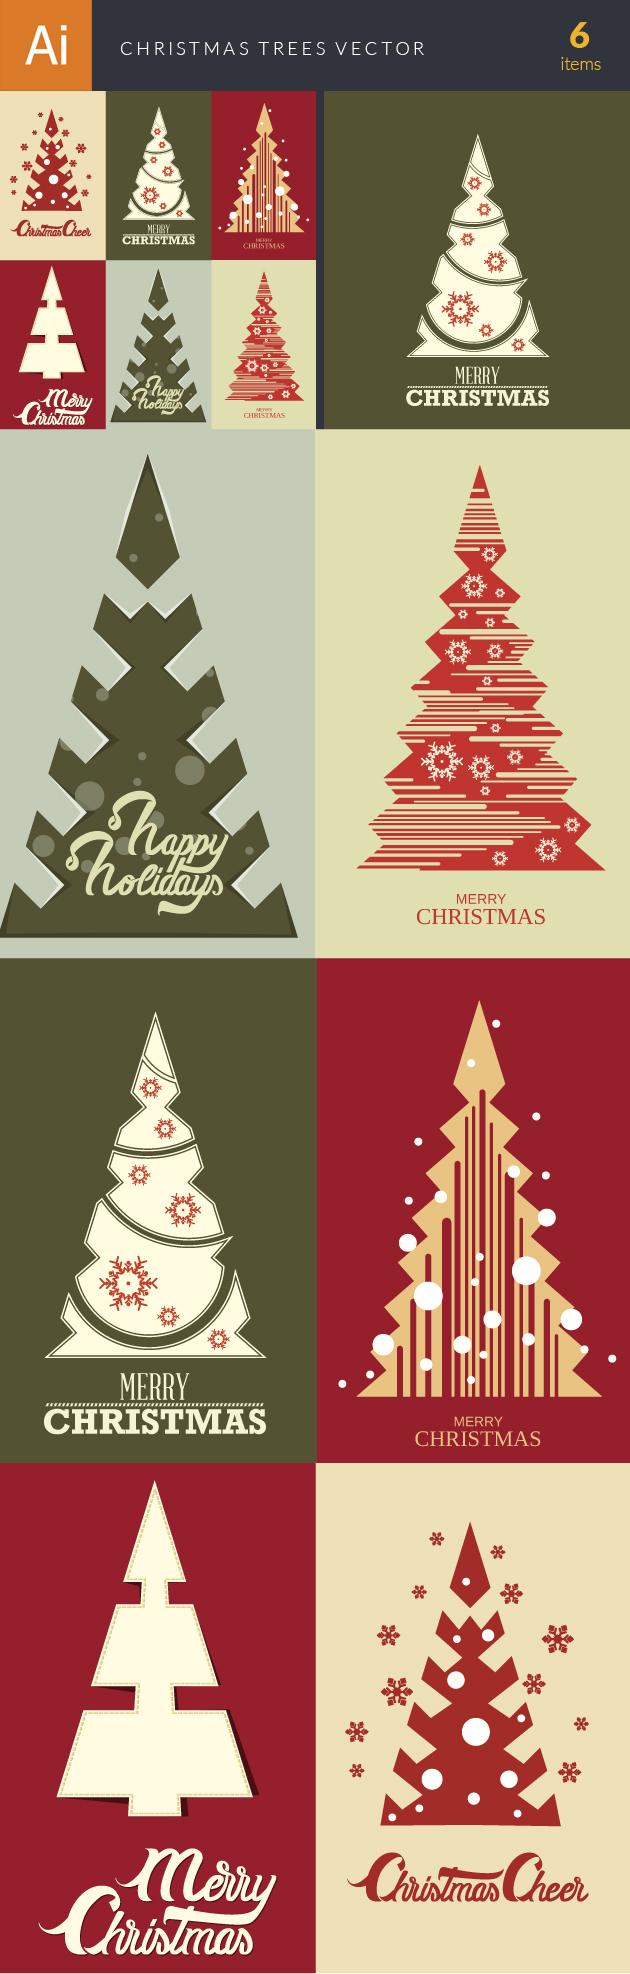 Christmas Trees Vector Set 18 designtnt christmas trees vector set 18 vector large